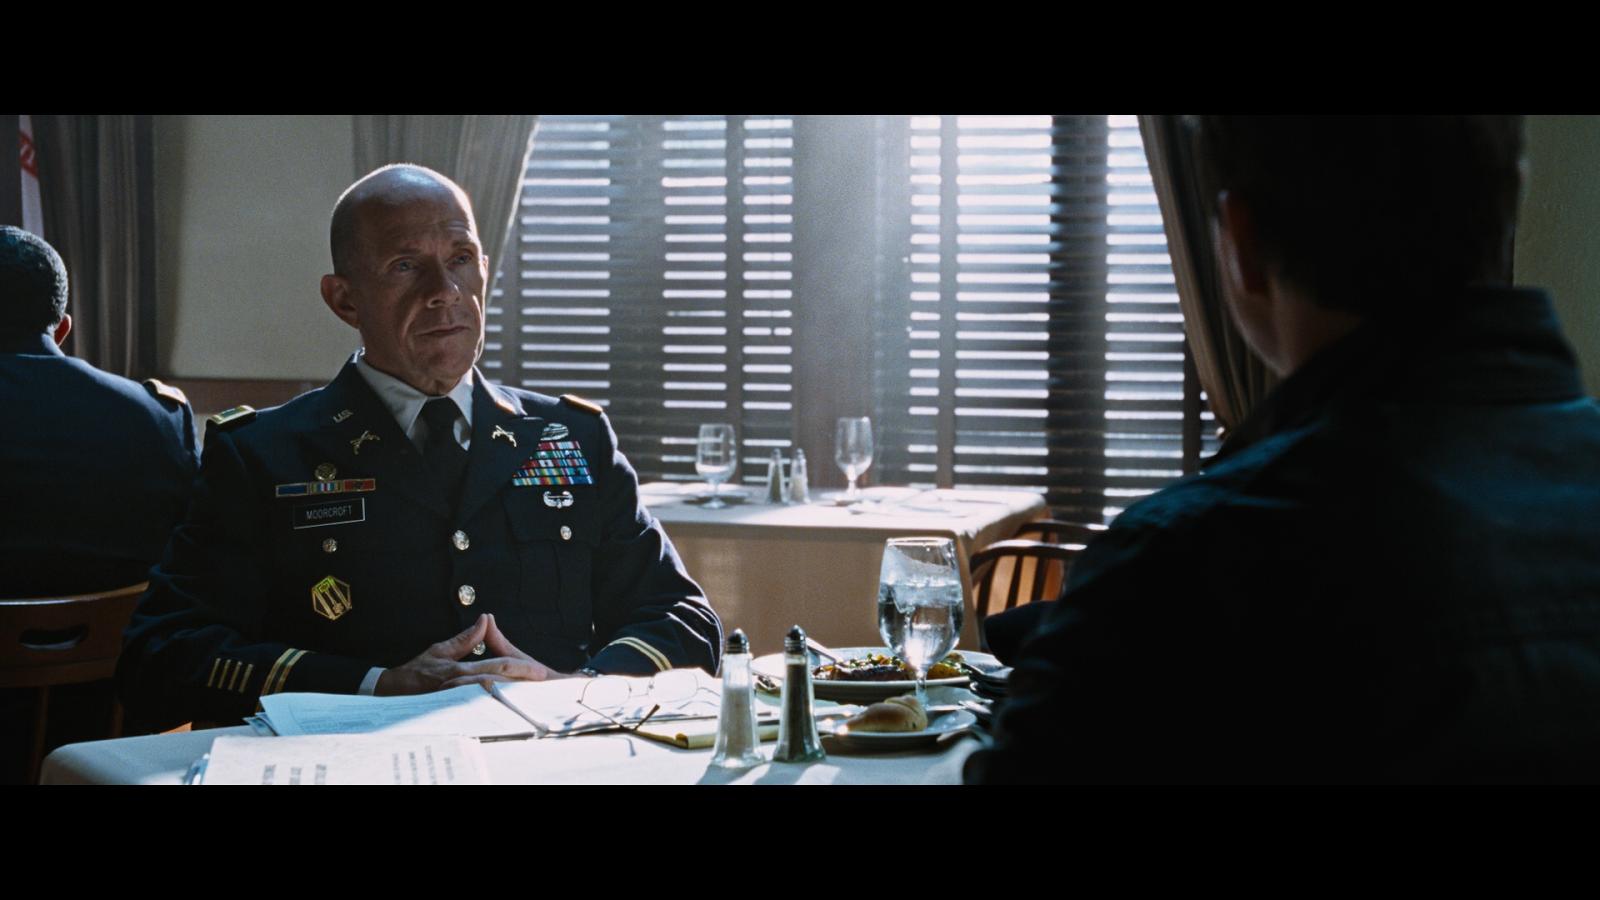 Jack Reacher Sin Regreso (2016) 1080p BD25 LATINO 3